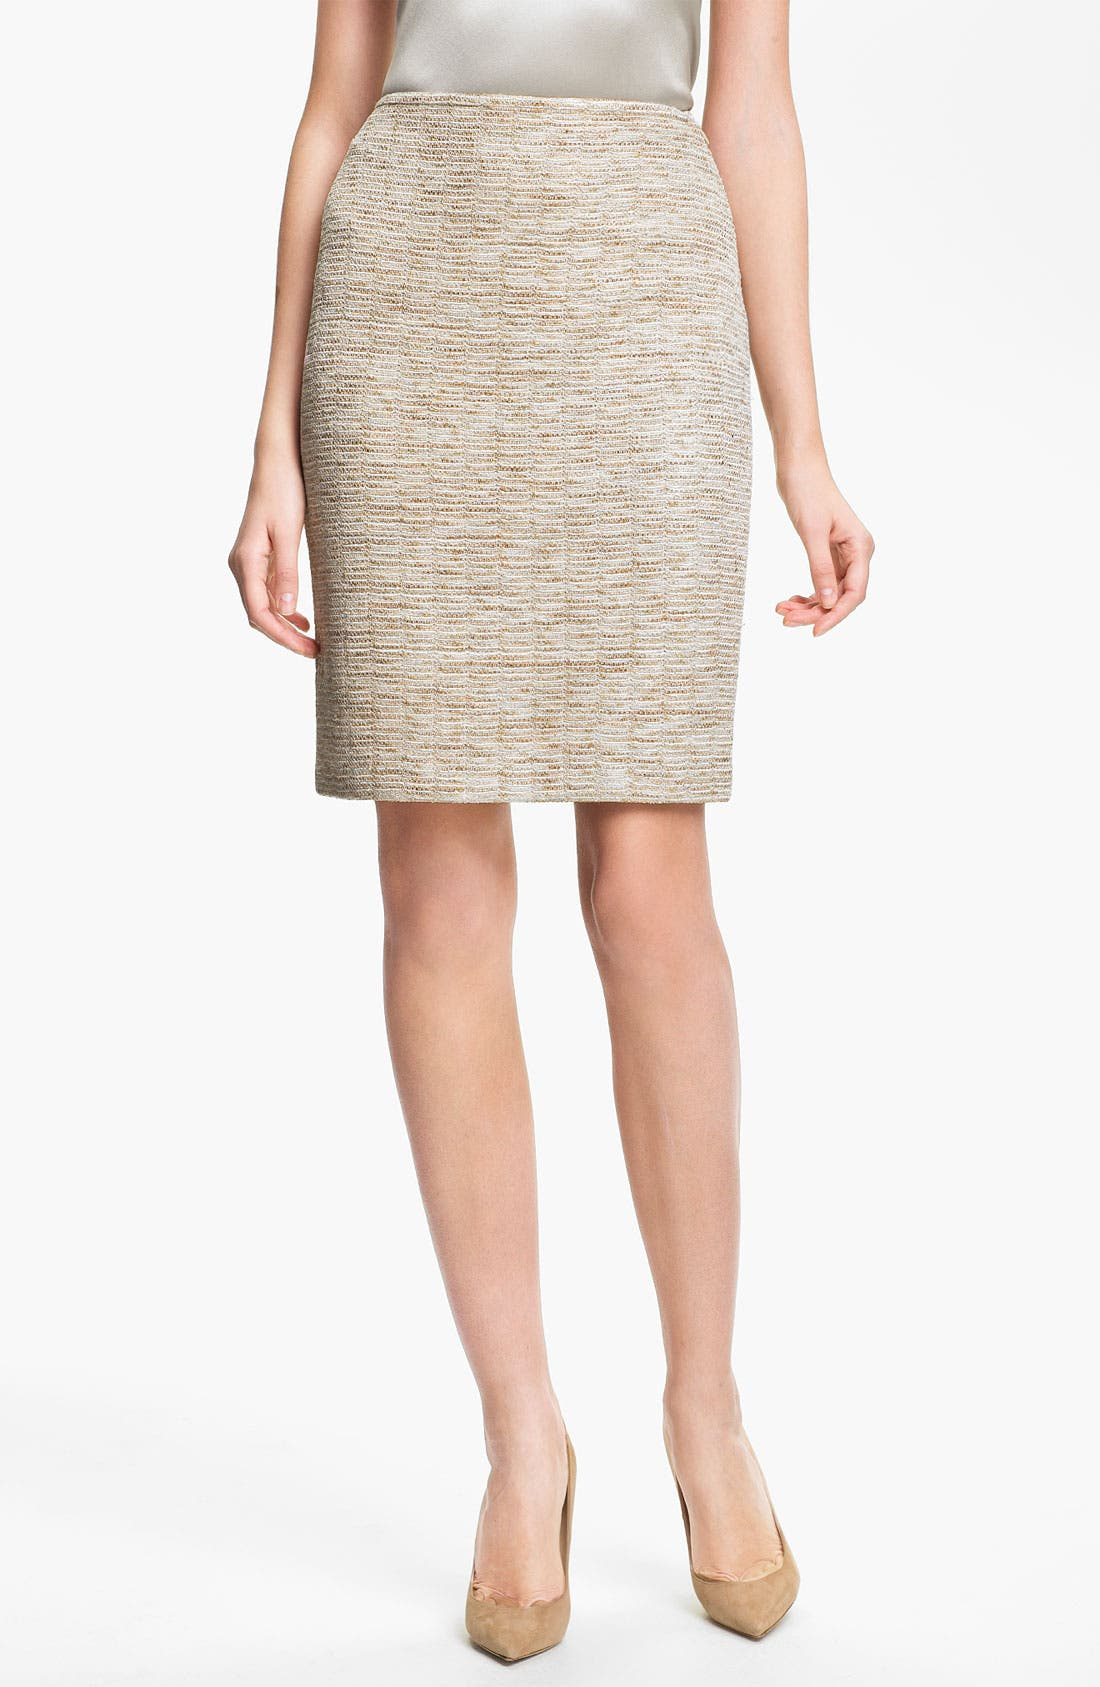 Alternate Image 1 Selected - St. John Collection Shimmer Knit Pencil Skirt